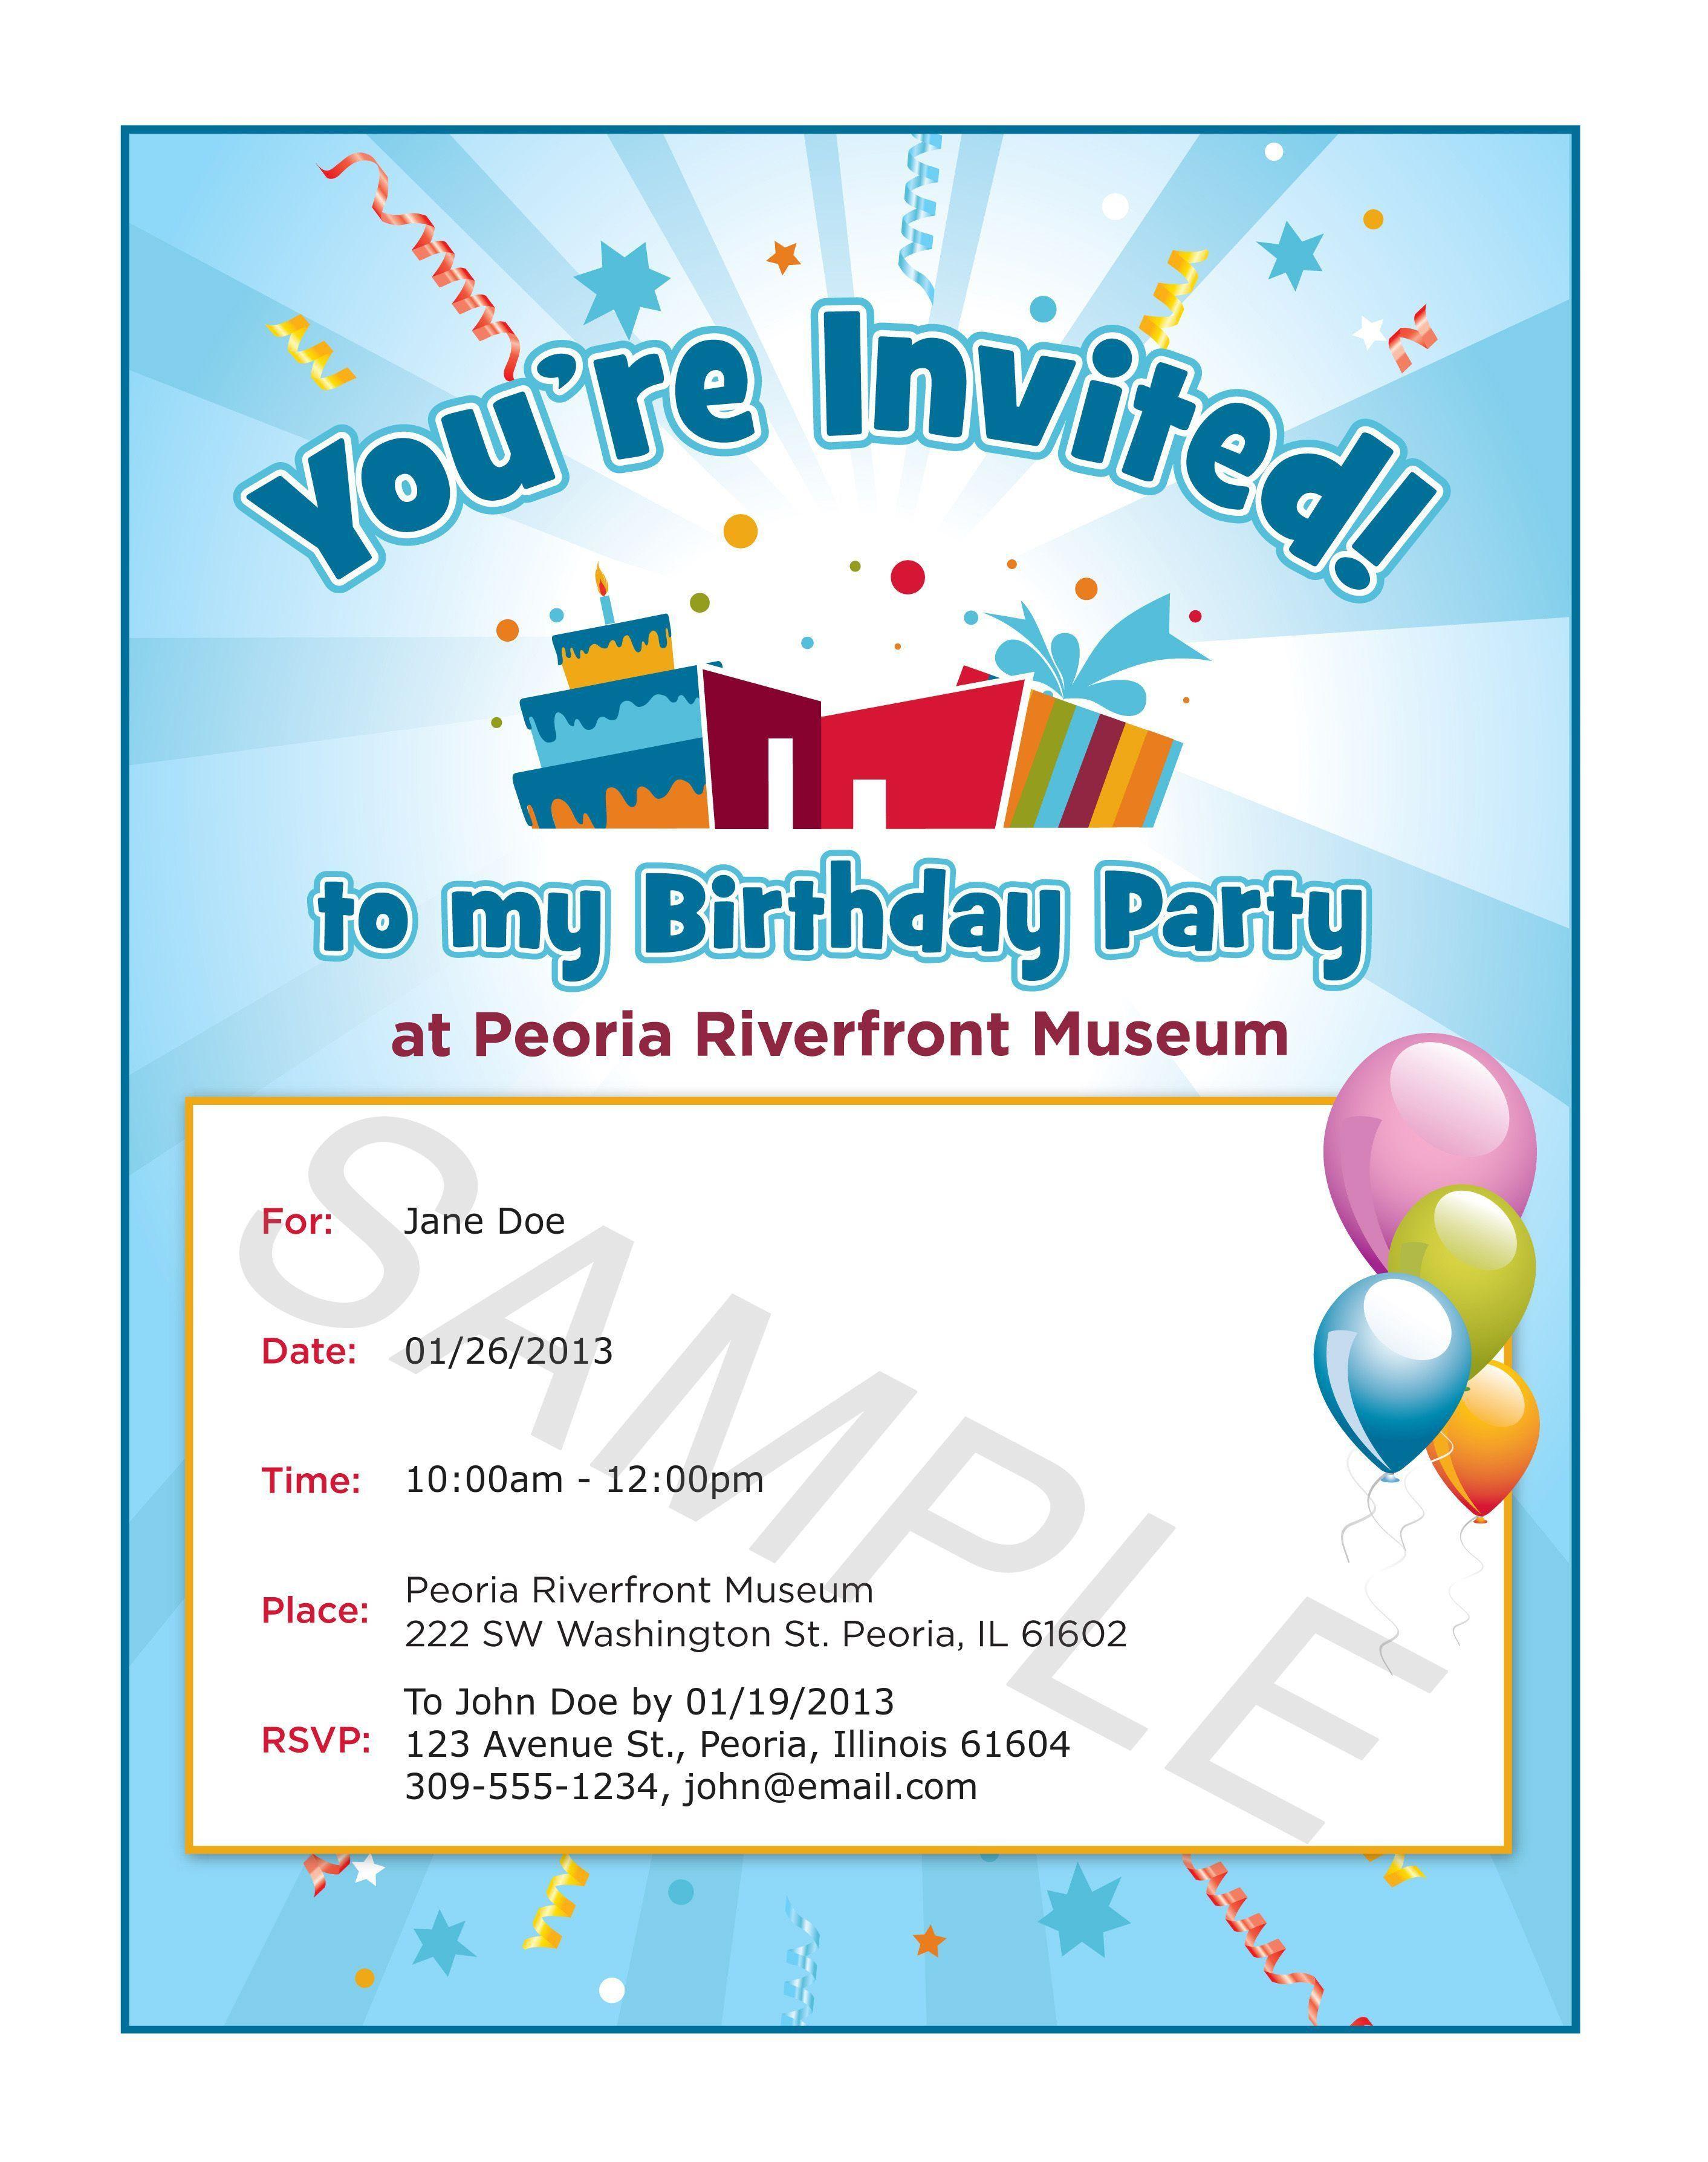 000 Rare Birthday Invite Template Word Free Concept  Party InvitationFull